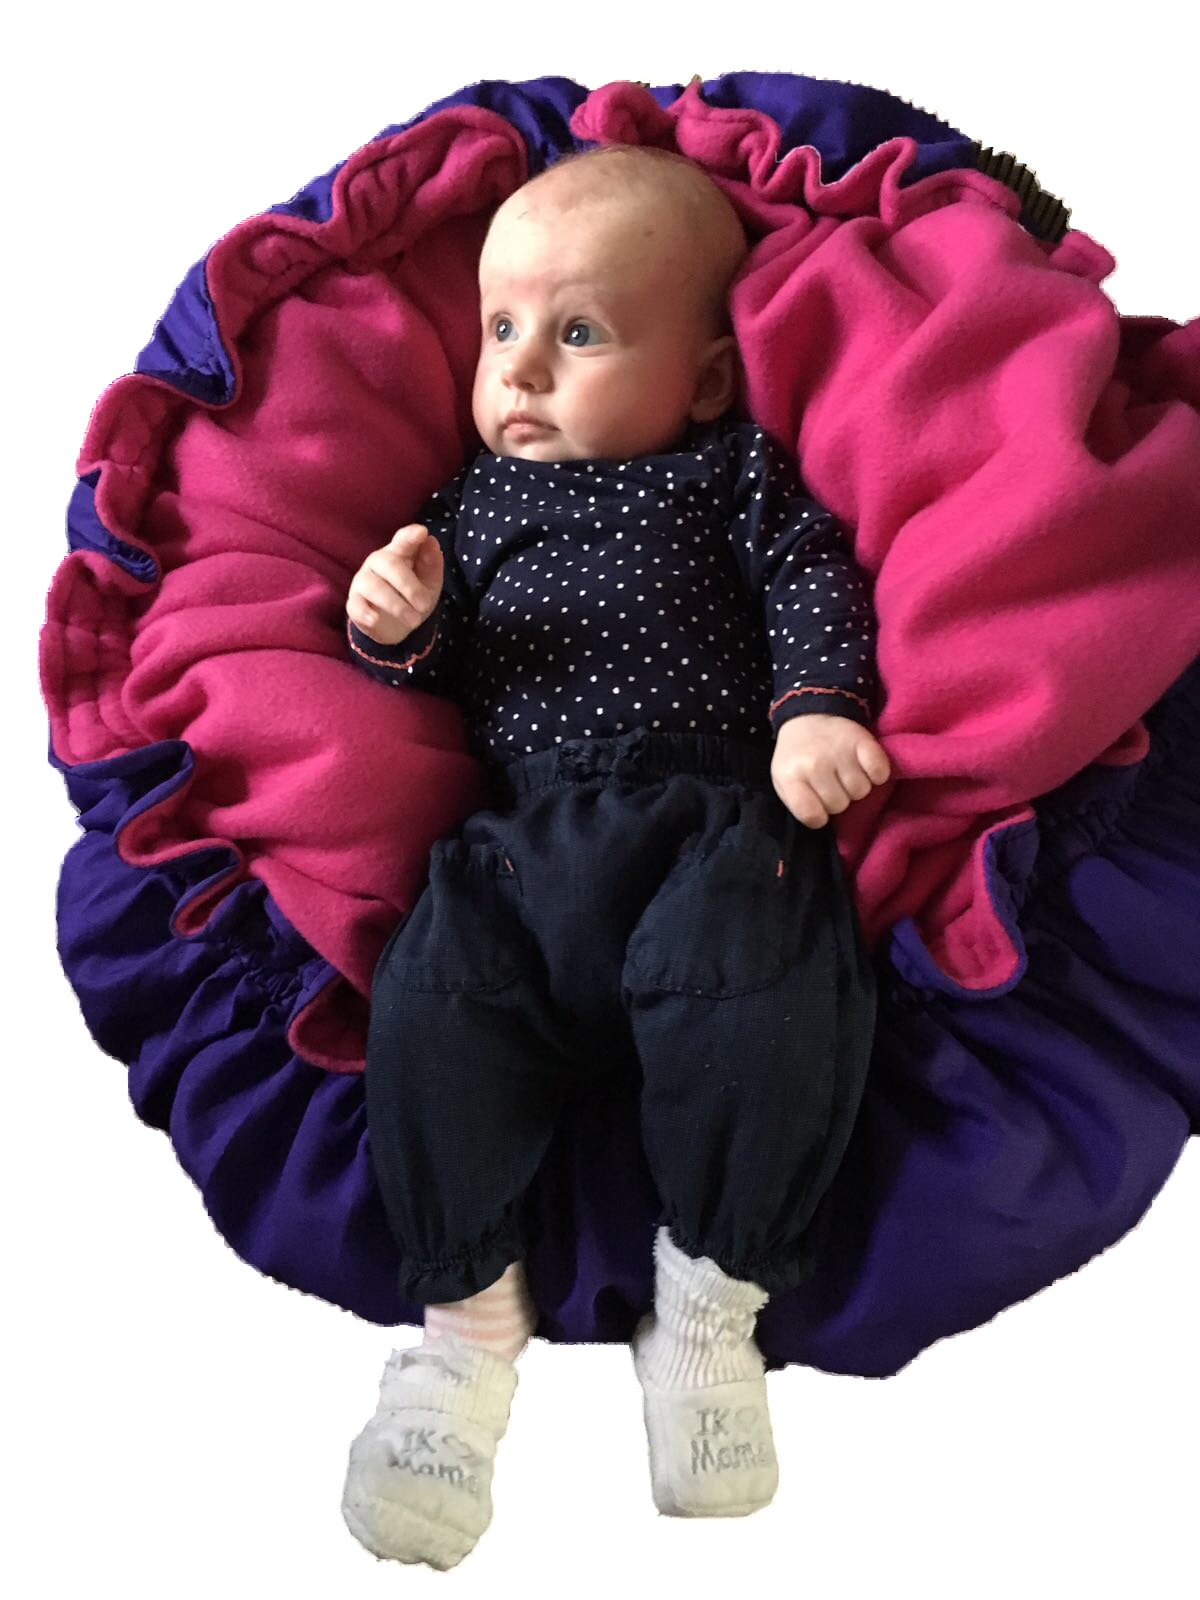 snoezelmand met baby